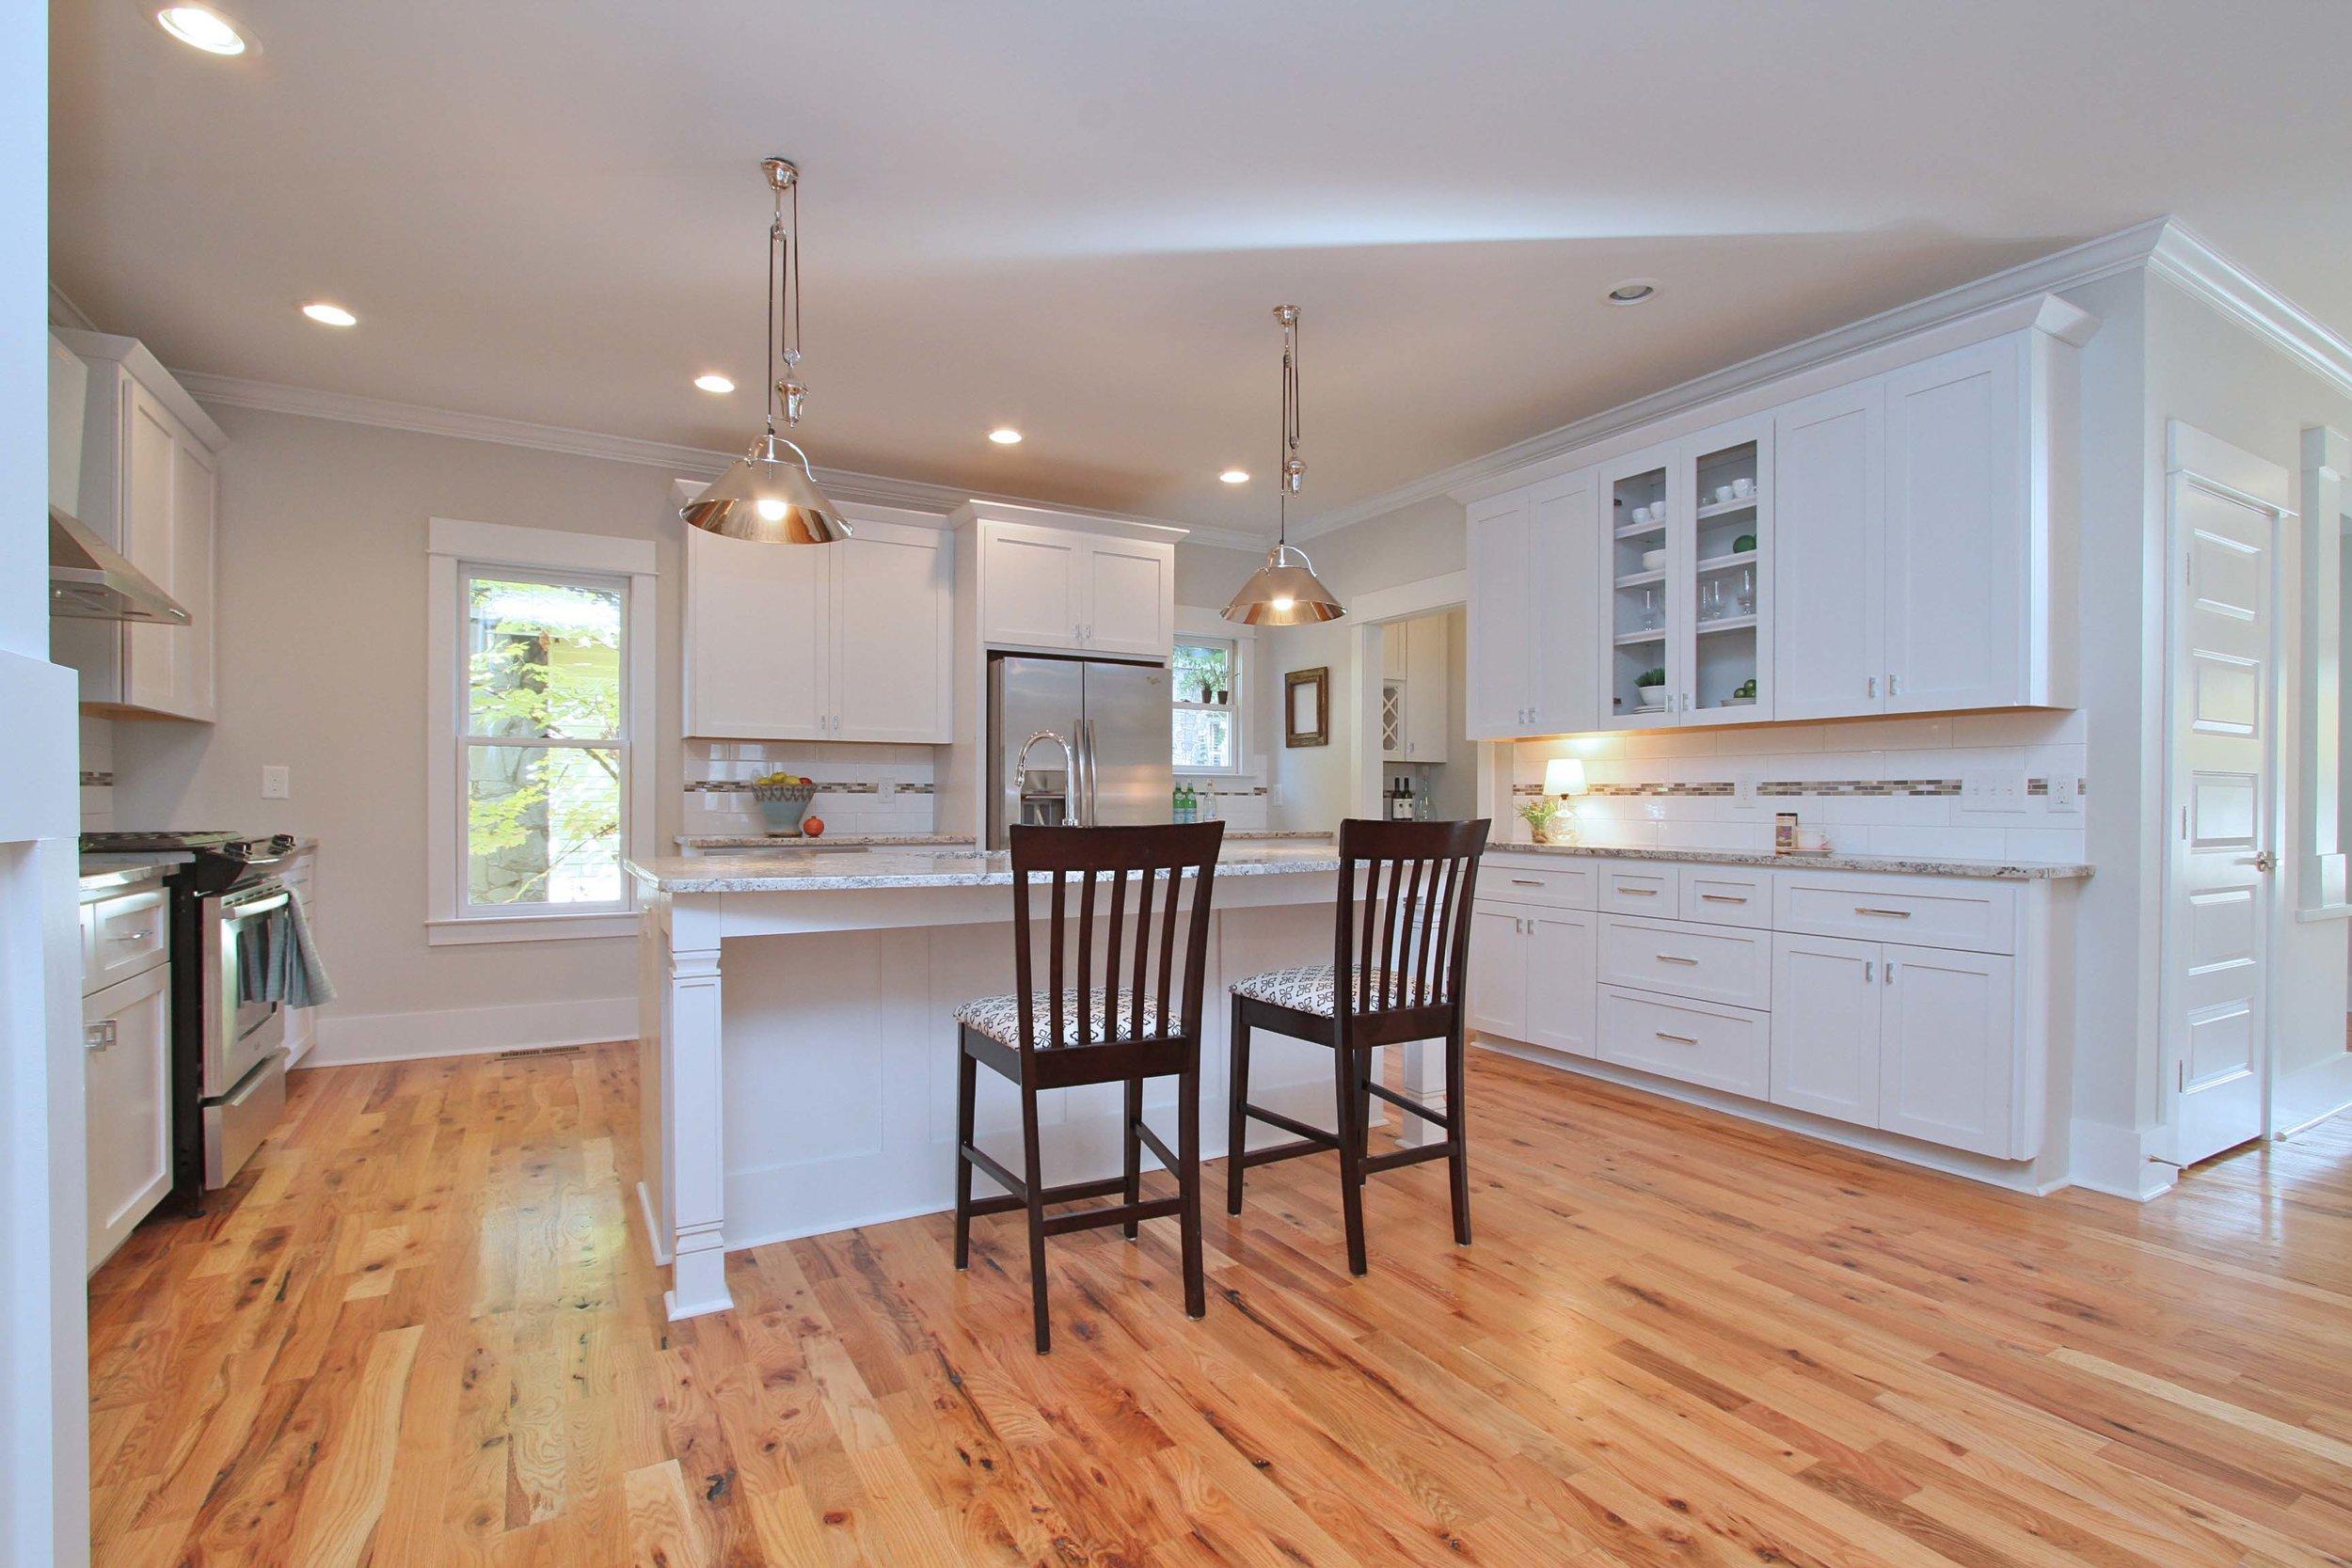 House-Plans-Online-Historic-Nashville-Peggy-Newman-Renovation-Kitchen-Storage-White-Murphy.jpg